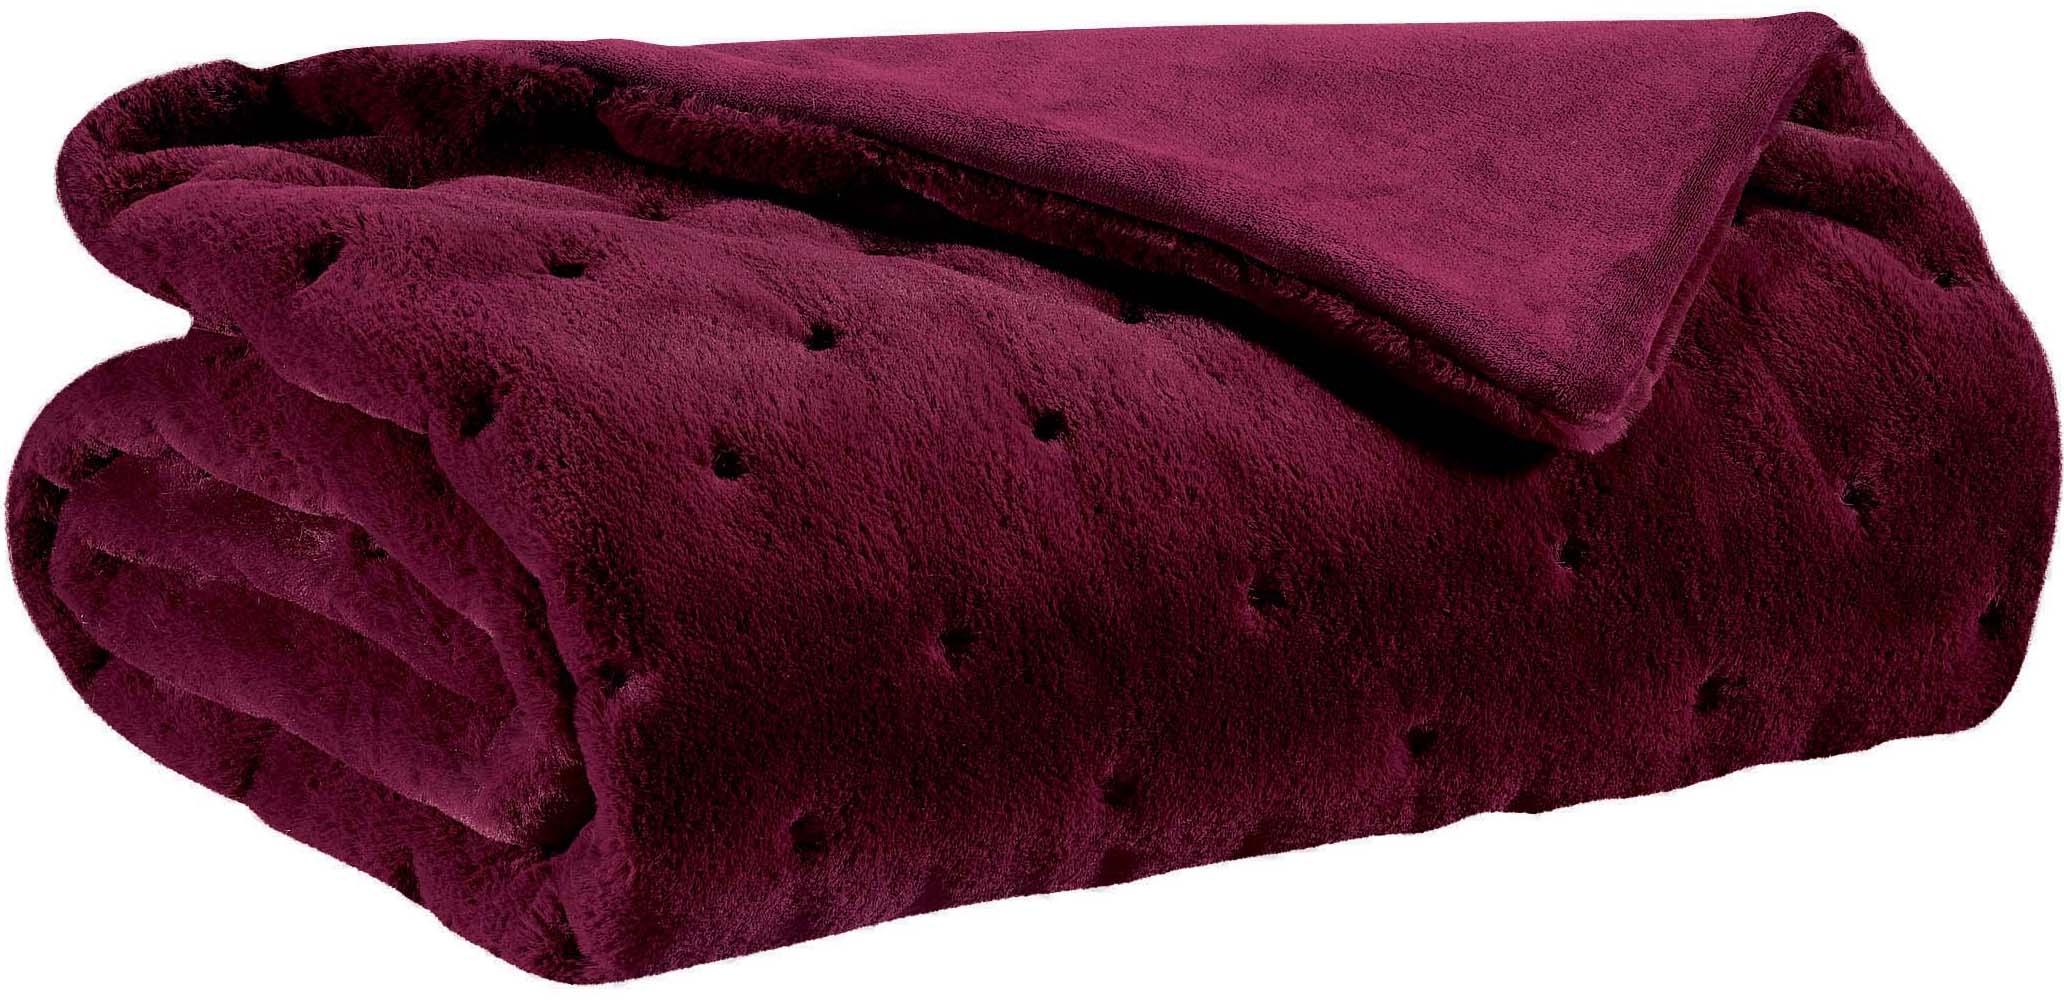 couvre lit yana lie de vin 230 x 250. Black Bedroom Furniture Sets. Home Design Ideas